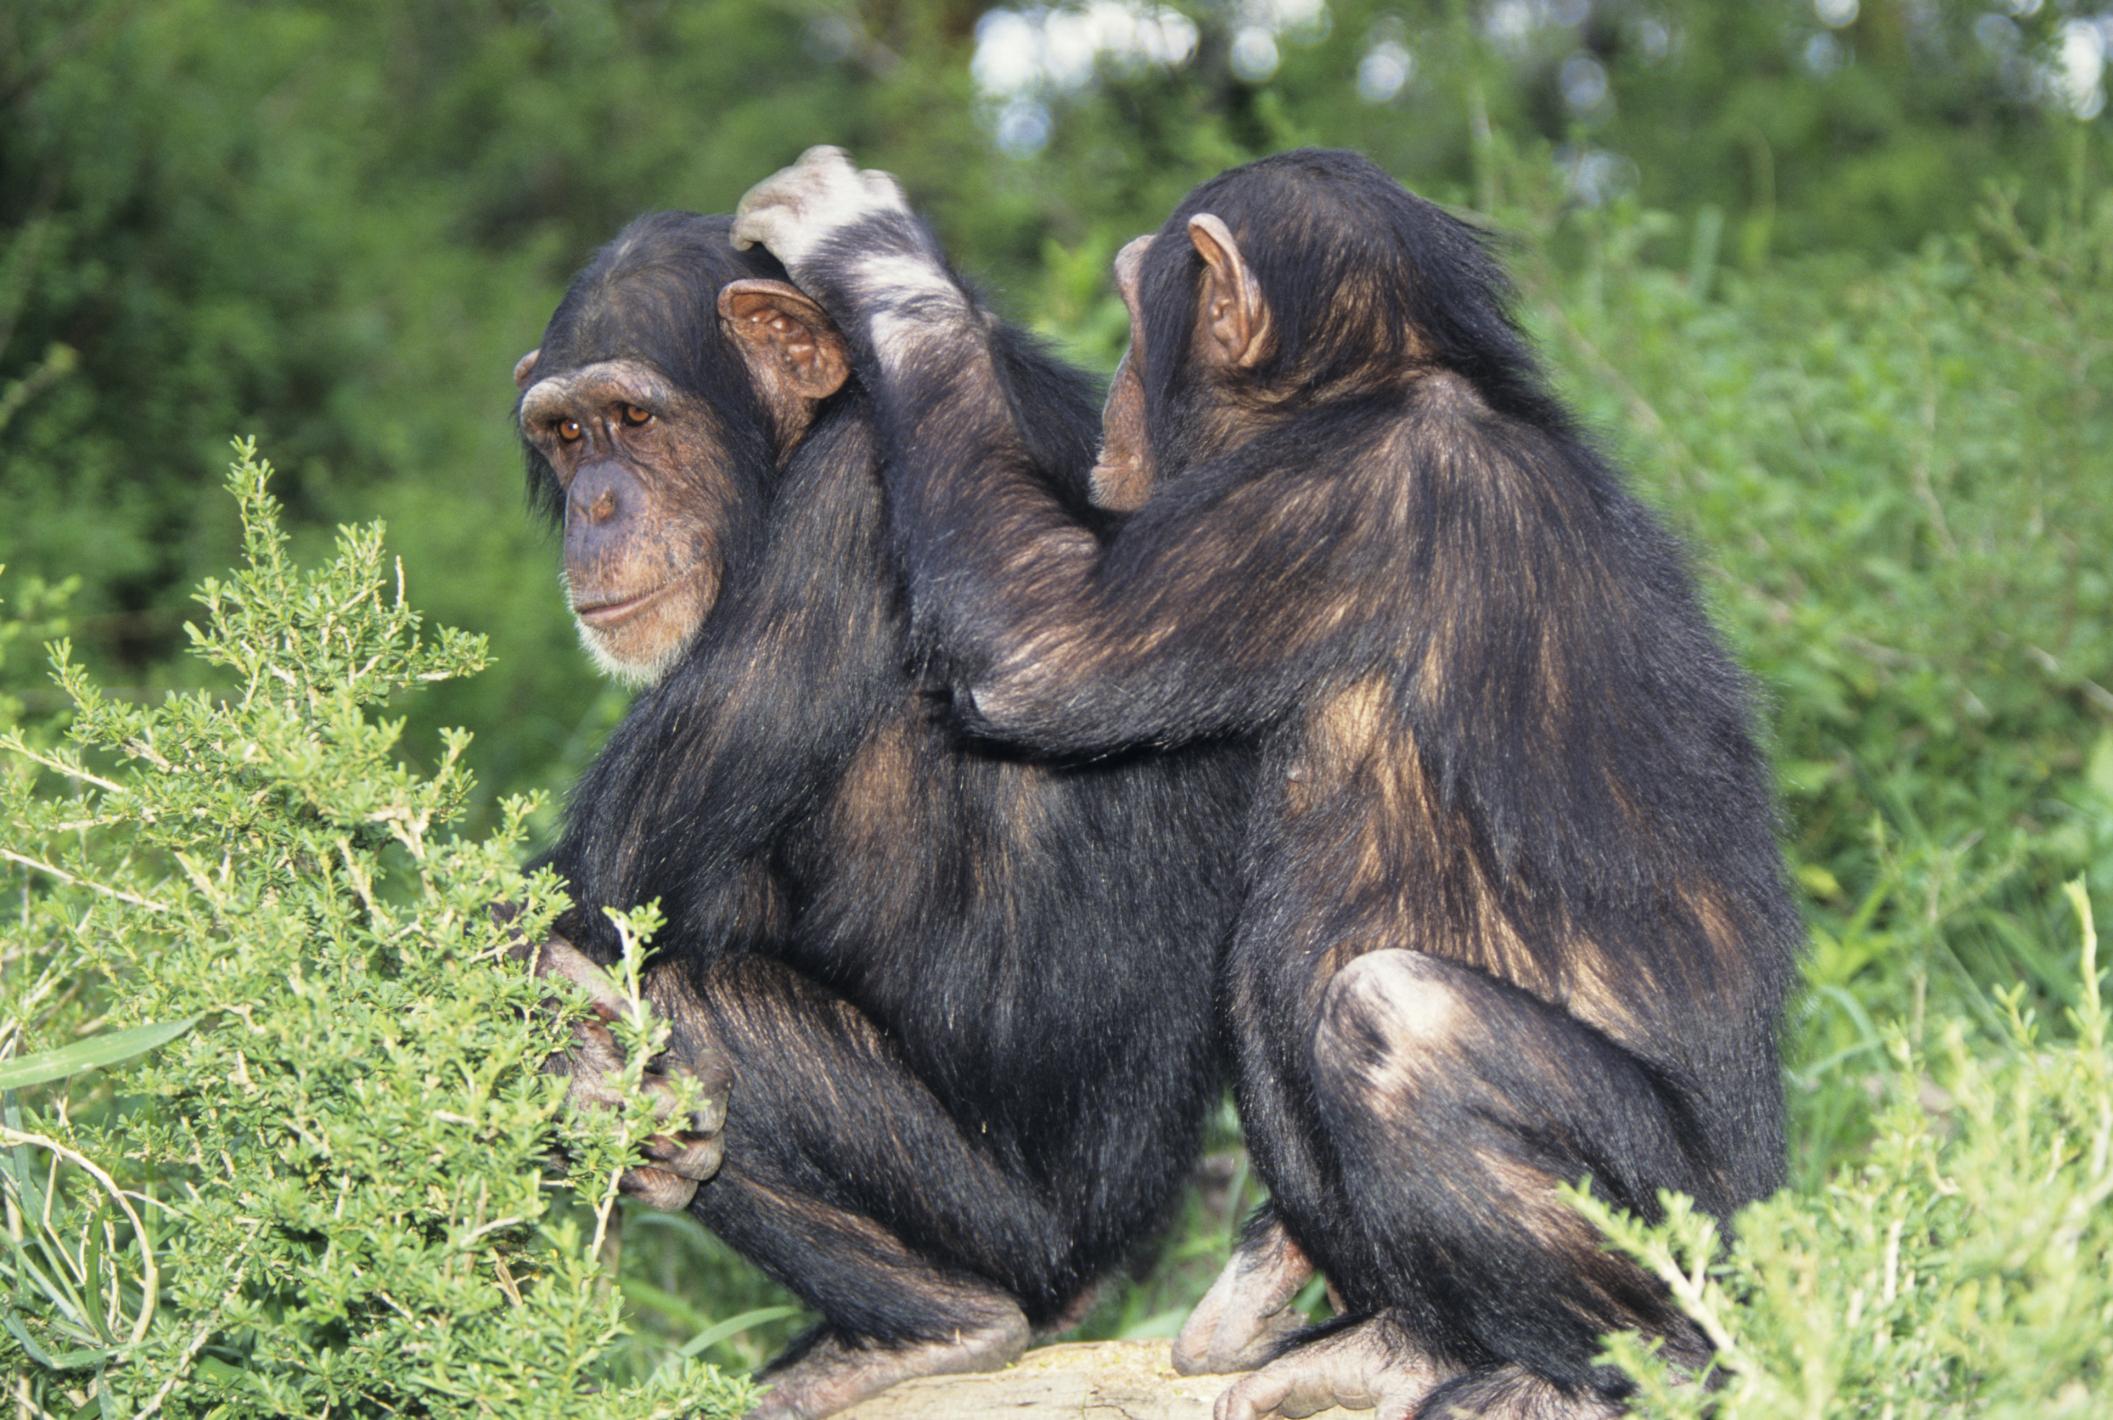 Chimpanzee Mating Habits | Sciencing